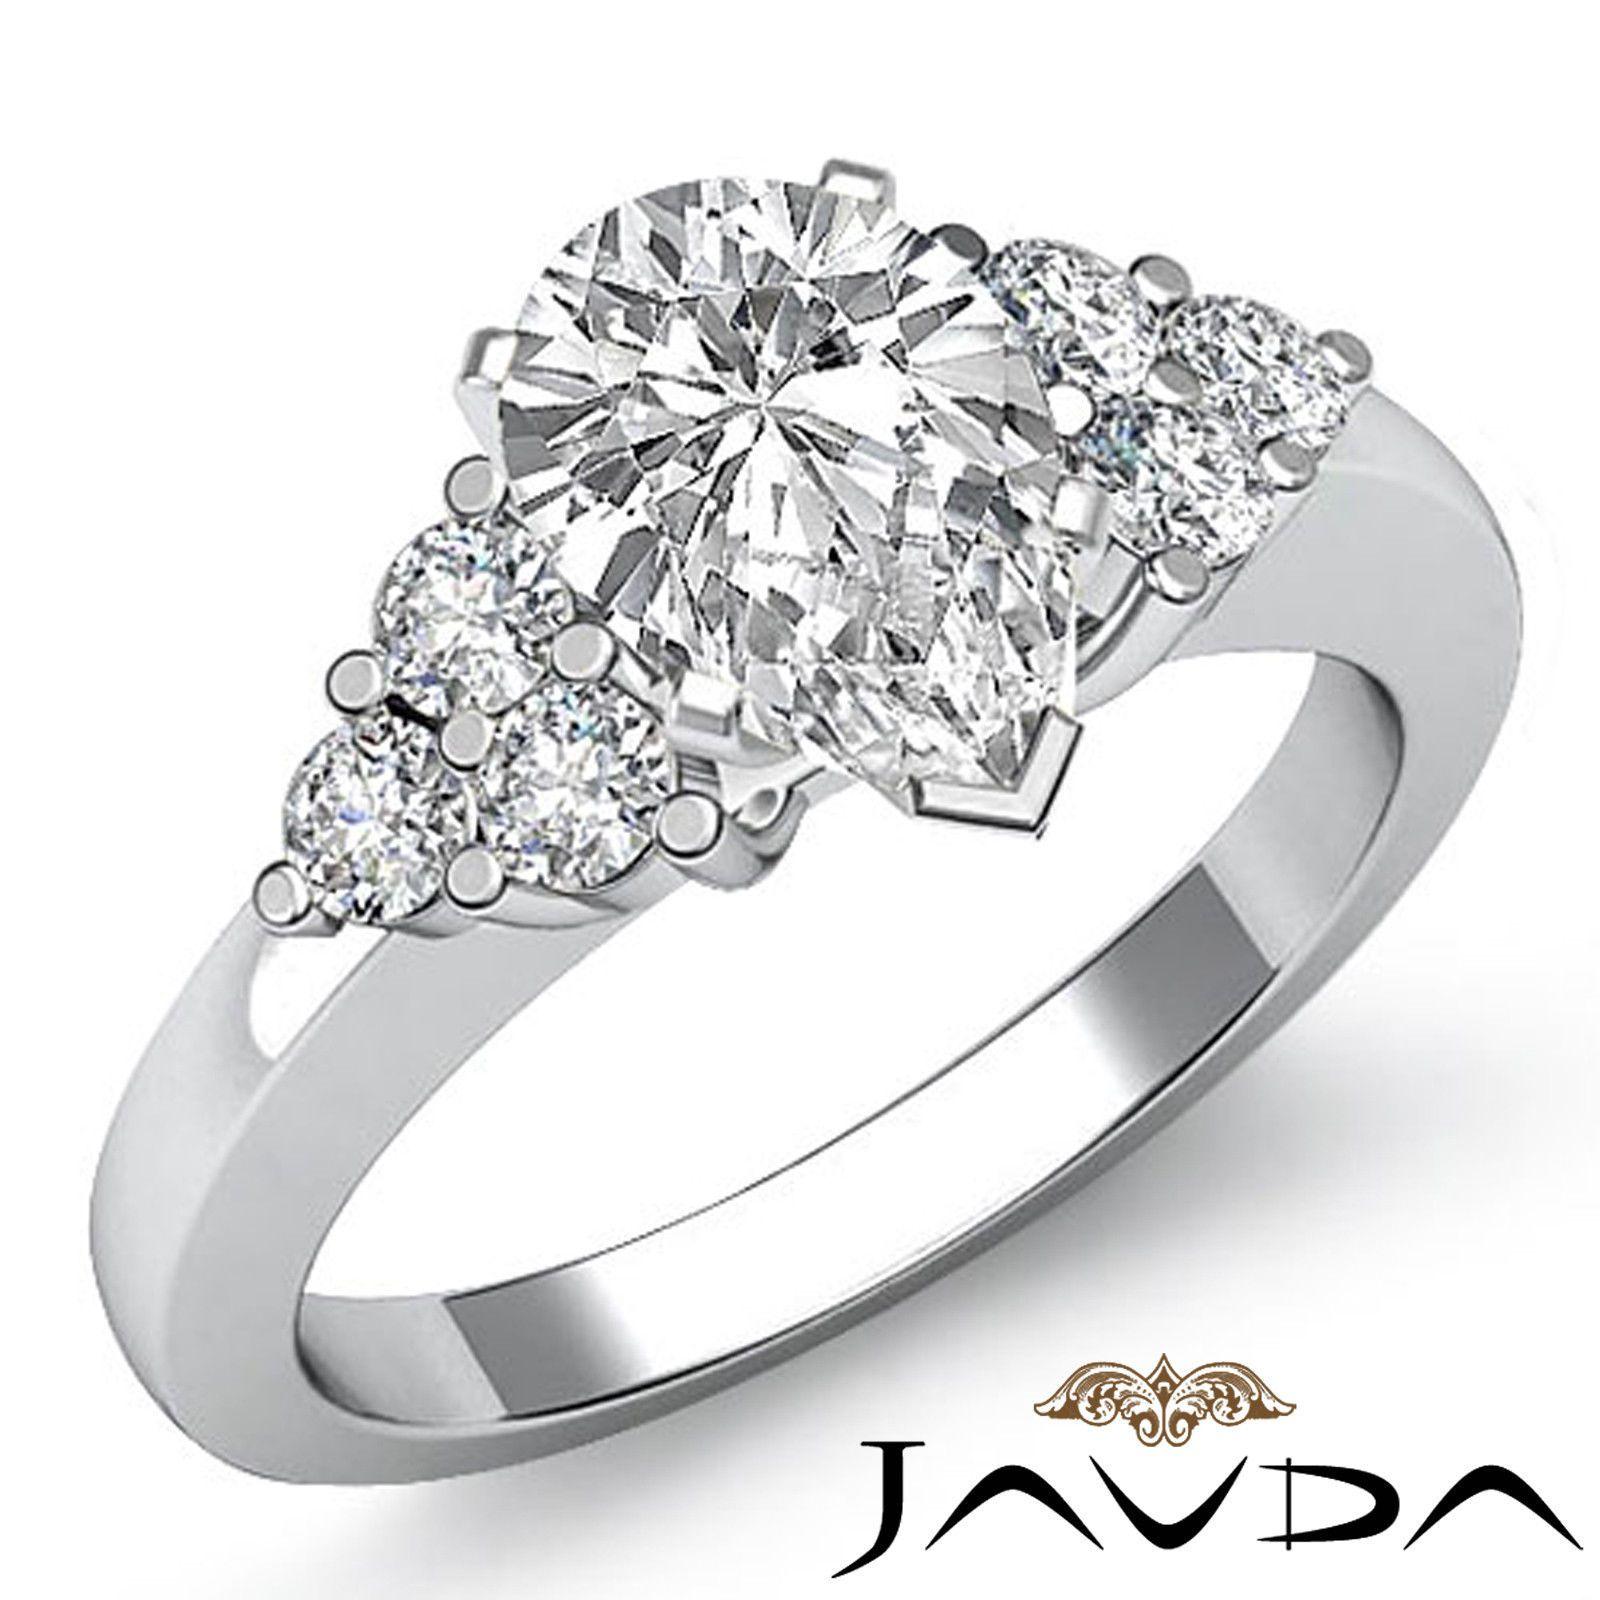 Pear diamond ideal three stone engagement ring gia f si k white